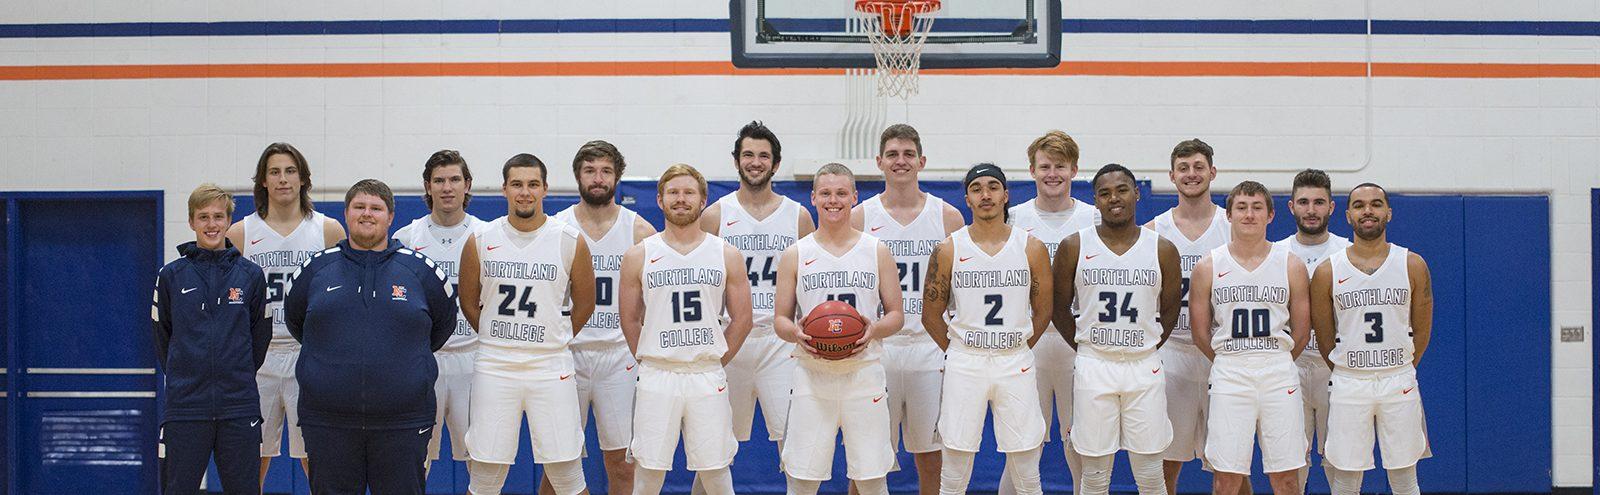 Mens Basketball Team Photo 2017